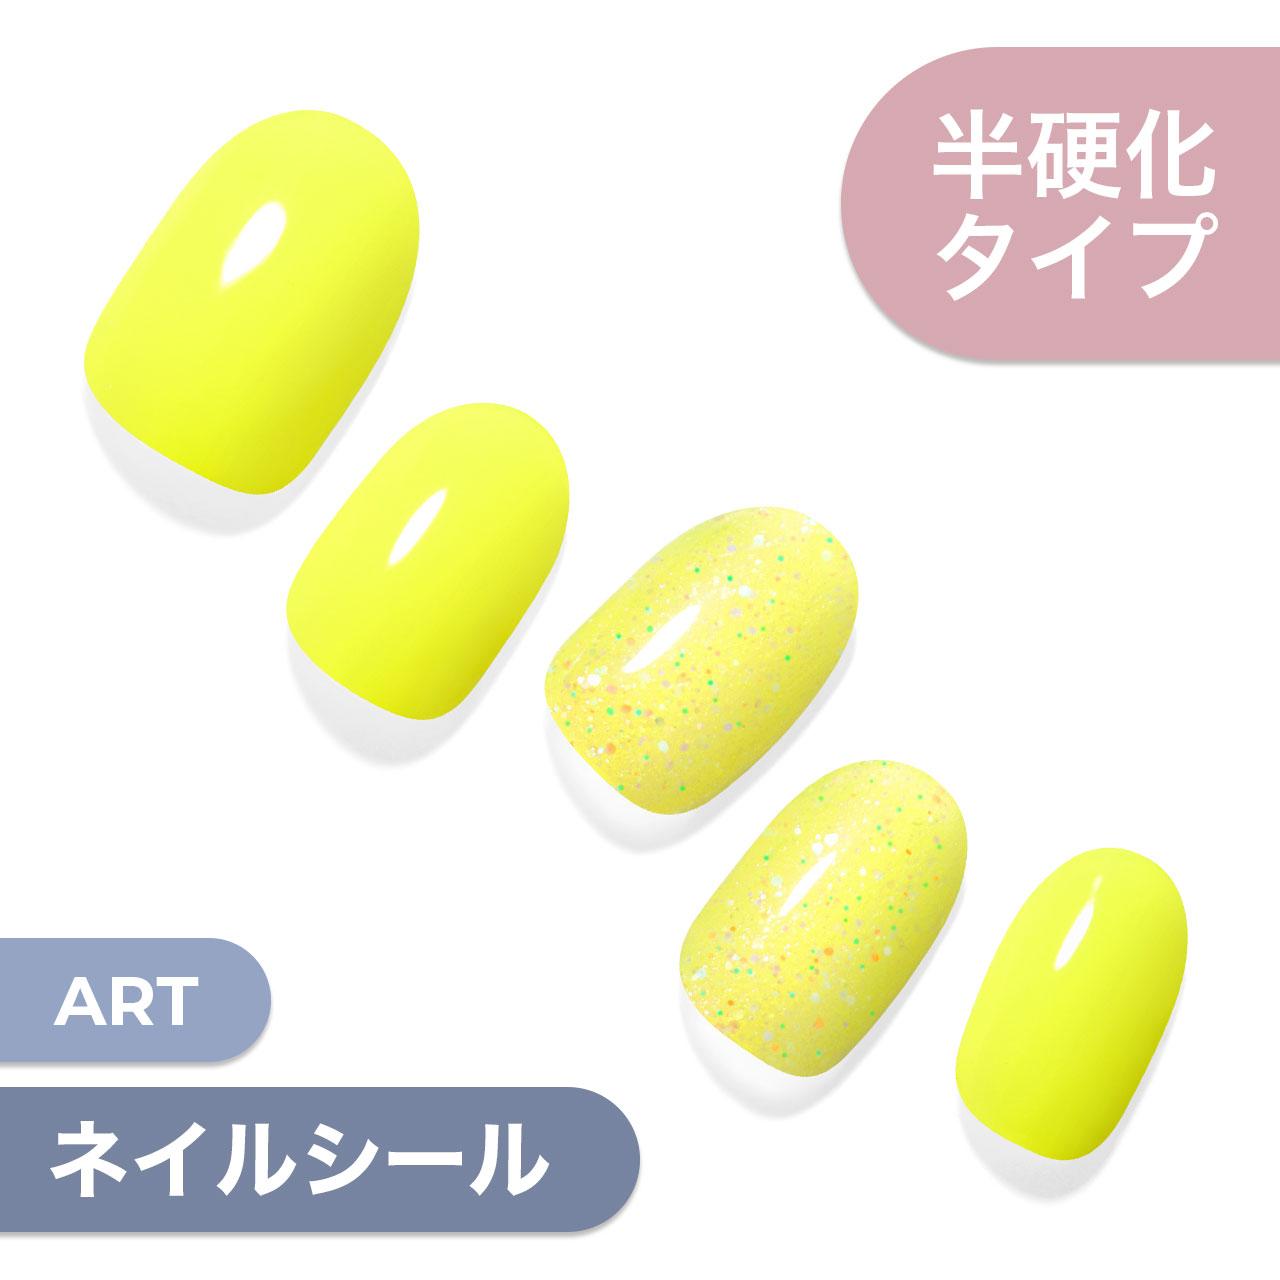 【Juicy Lemon】ダッシングディバグレーズ